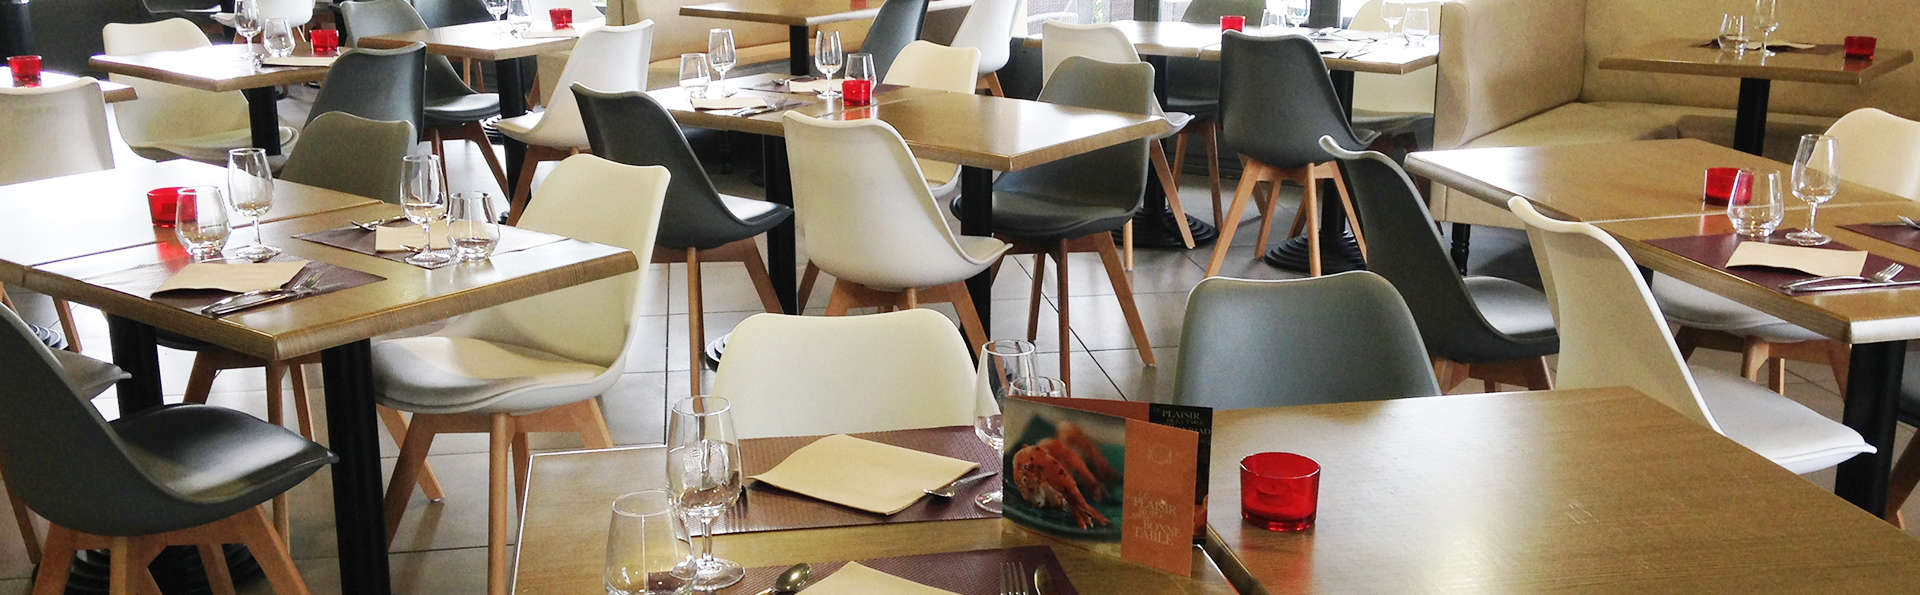 Week-end avec dîner à Carcassonne